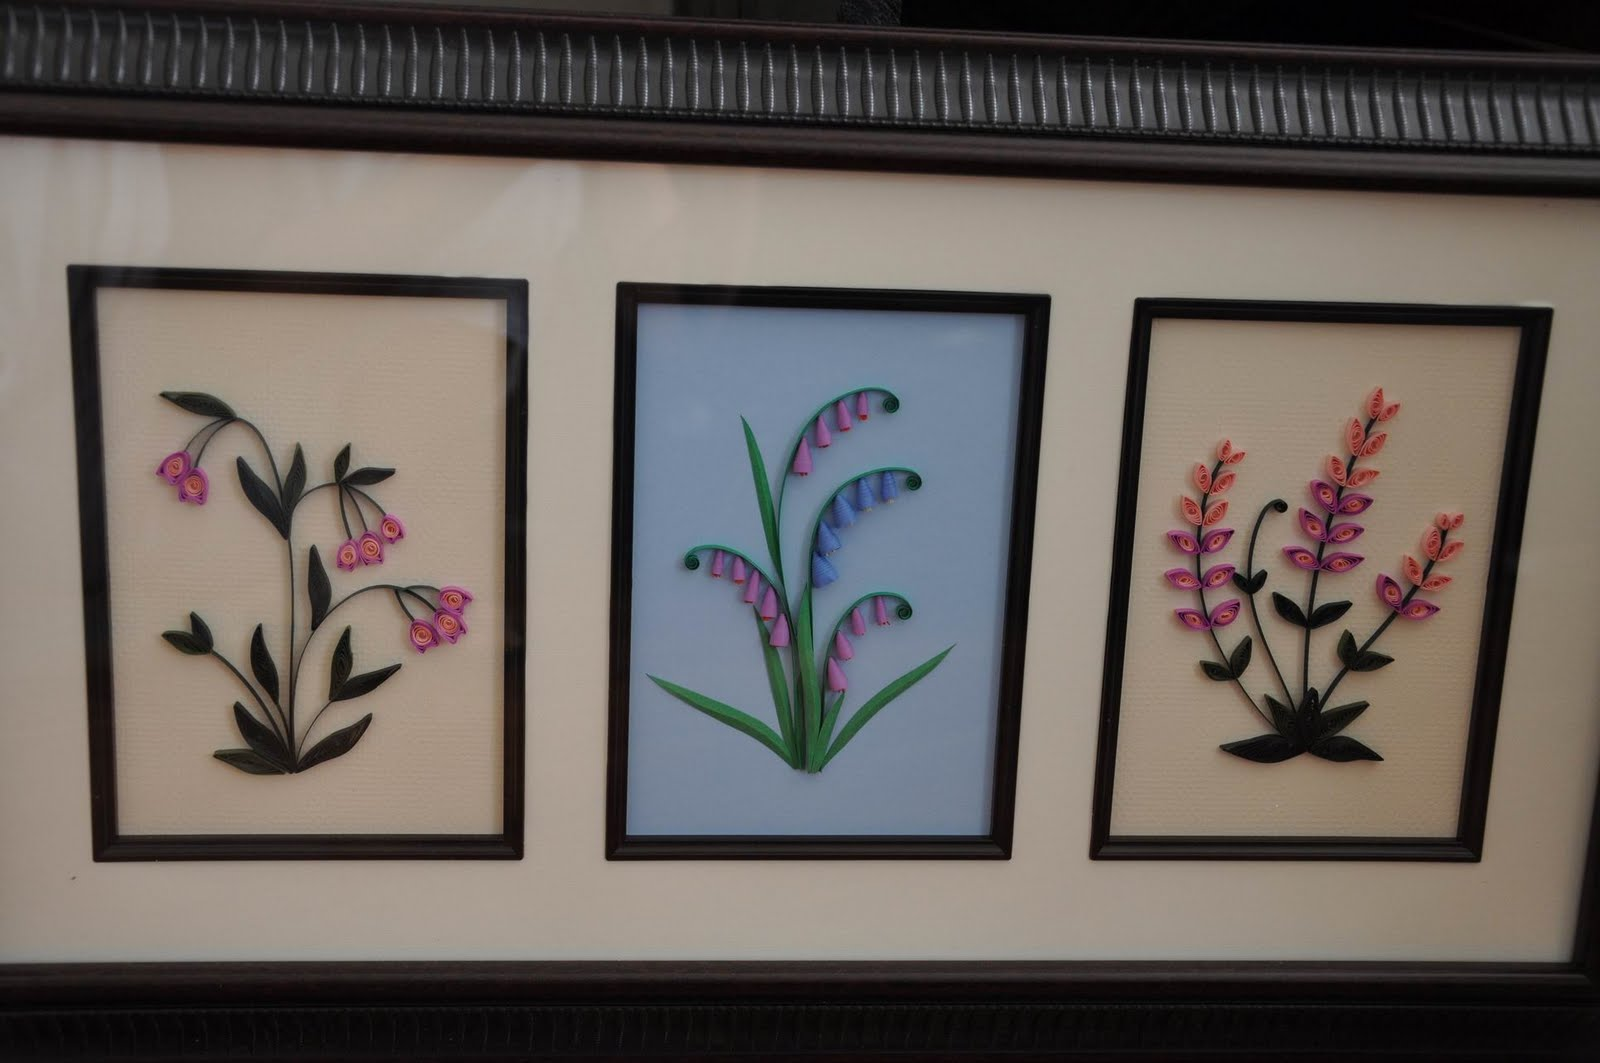 Paper Quilling Frame Designs - Creative Art & Craft Work